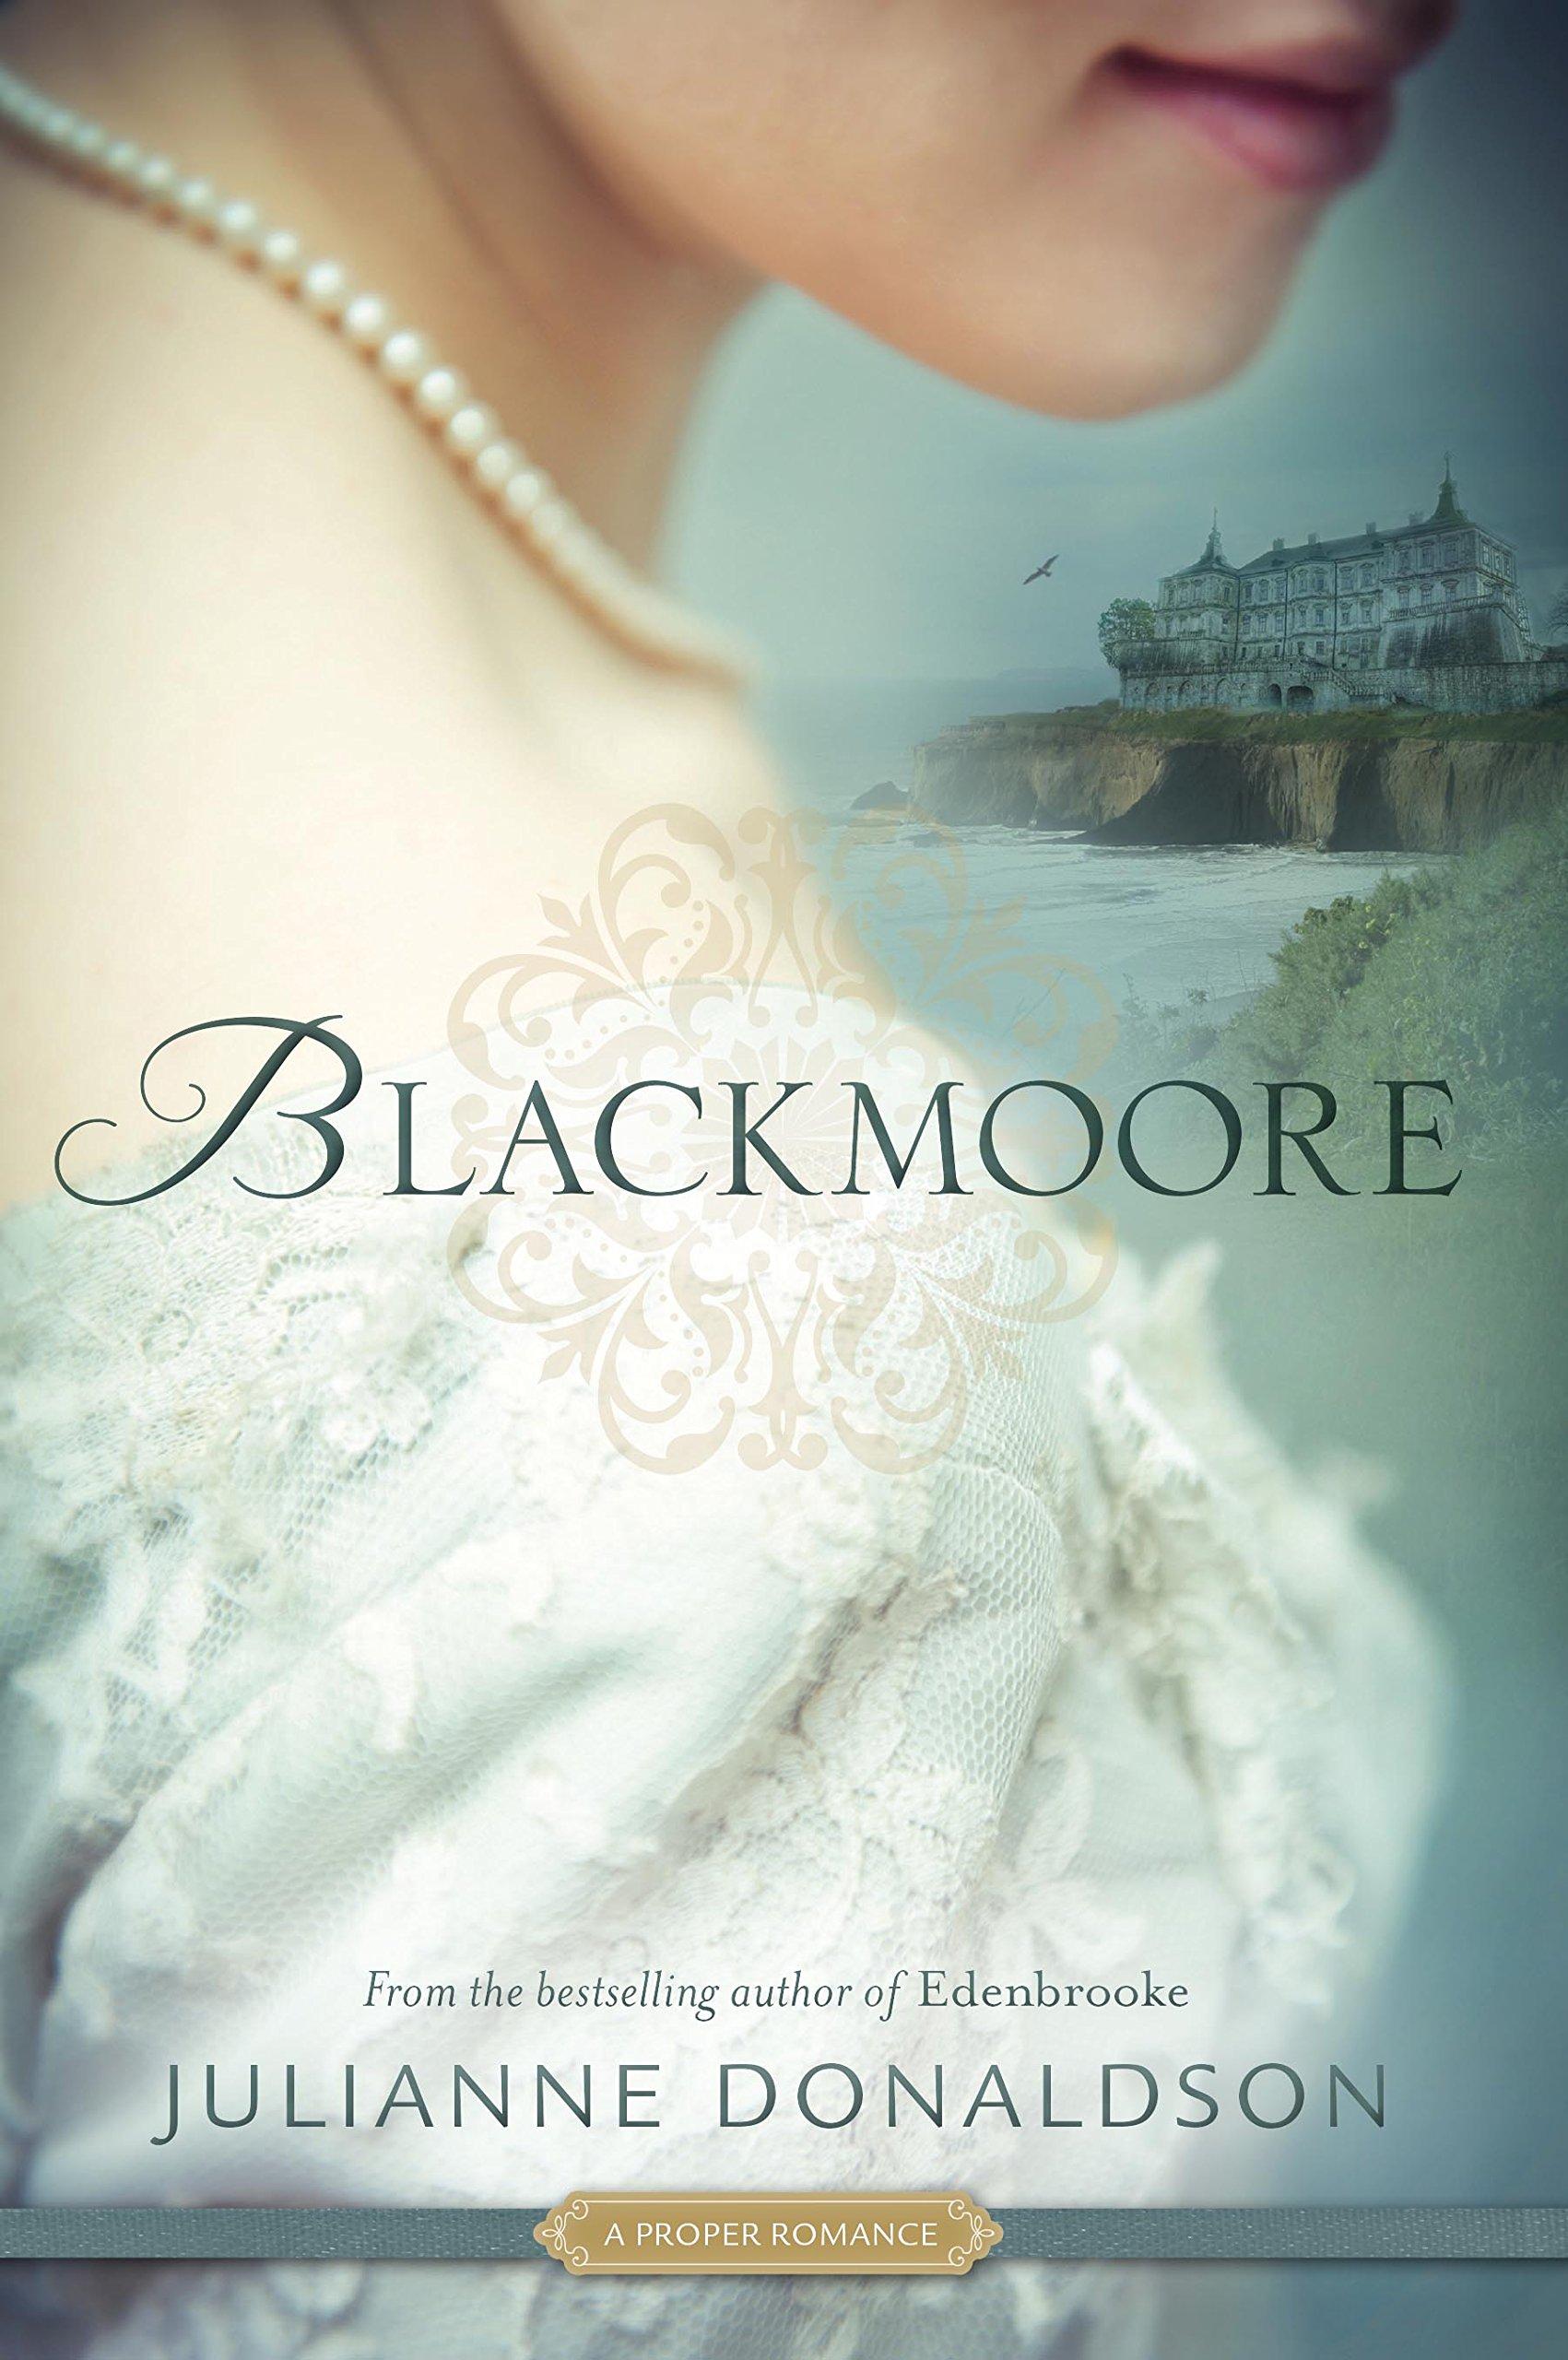 Blackmoore - A Proper Romance 02, Julianne Donaldson (Rom) 81E4DkixKML